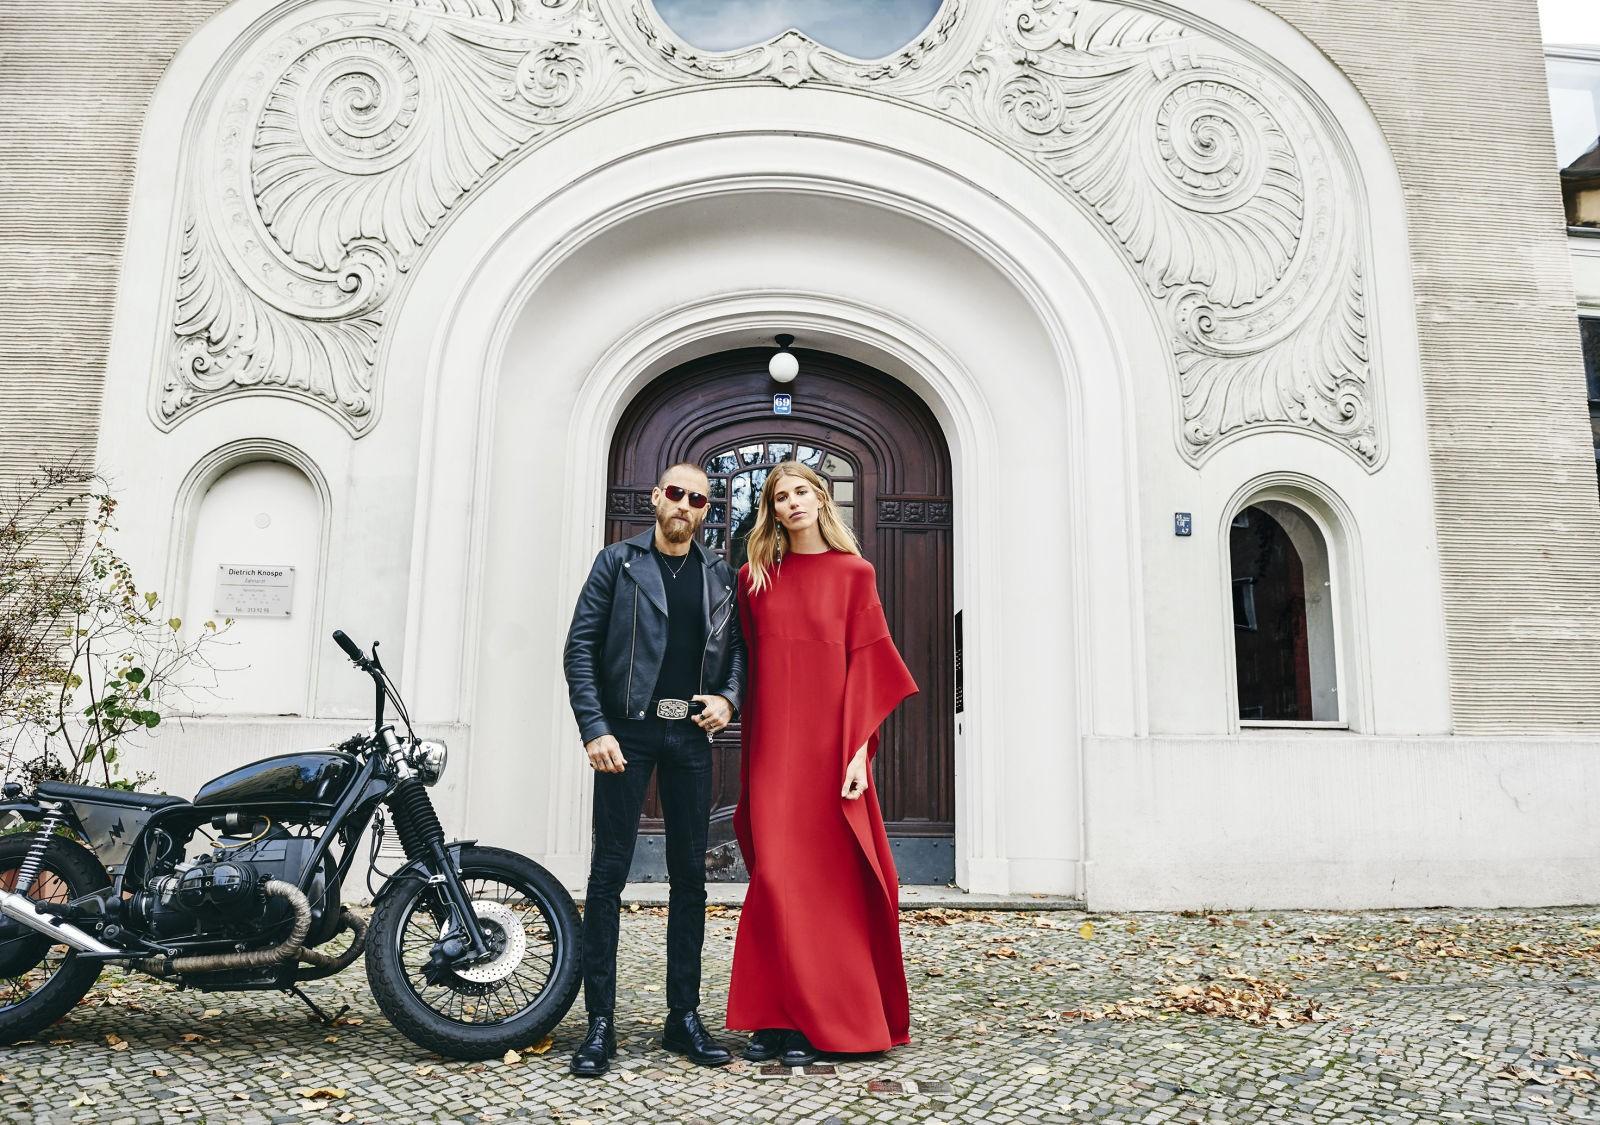 Iconic_Couples_VeronikaHeilbrunner_JustinOSheea_Fabulous_Muses_1